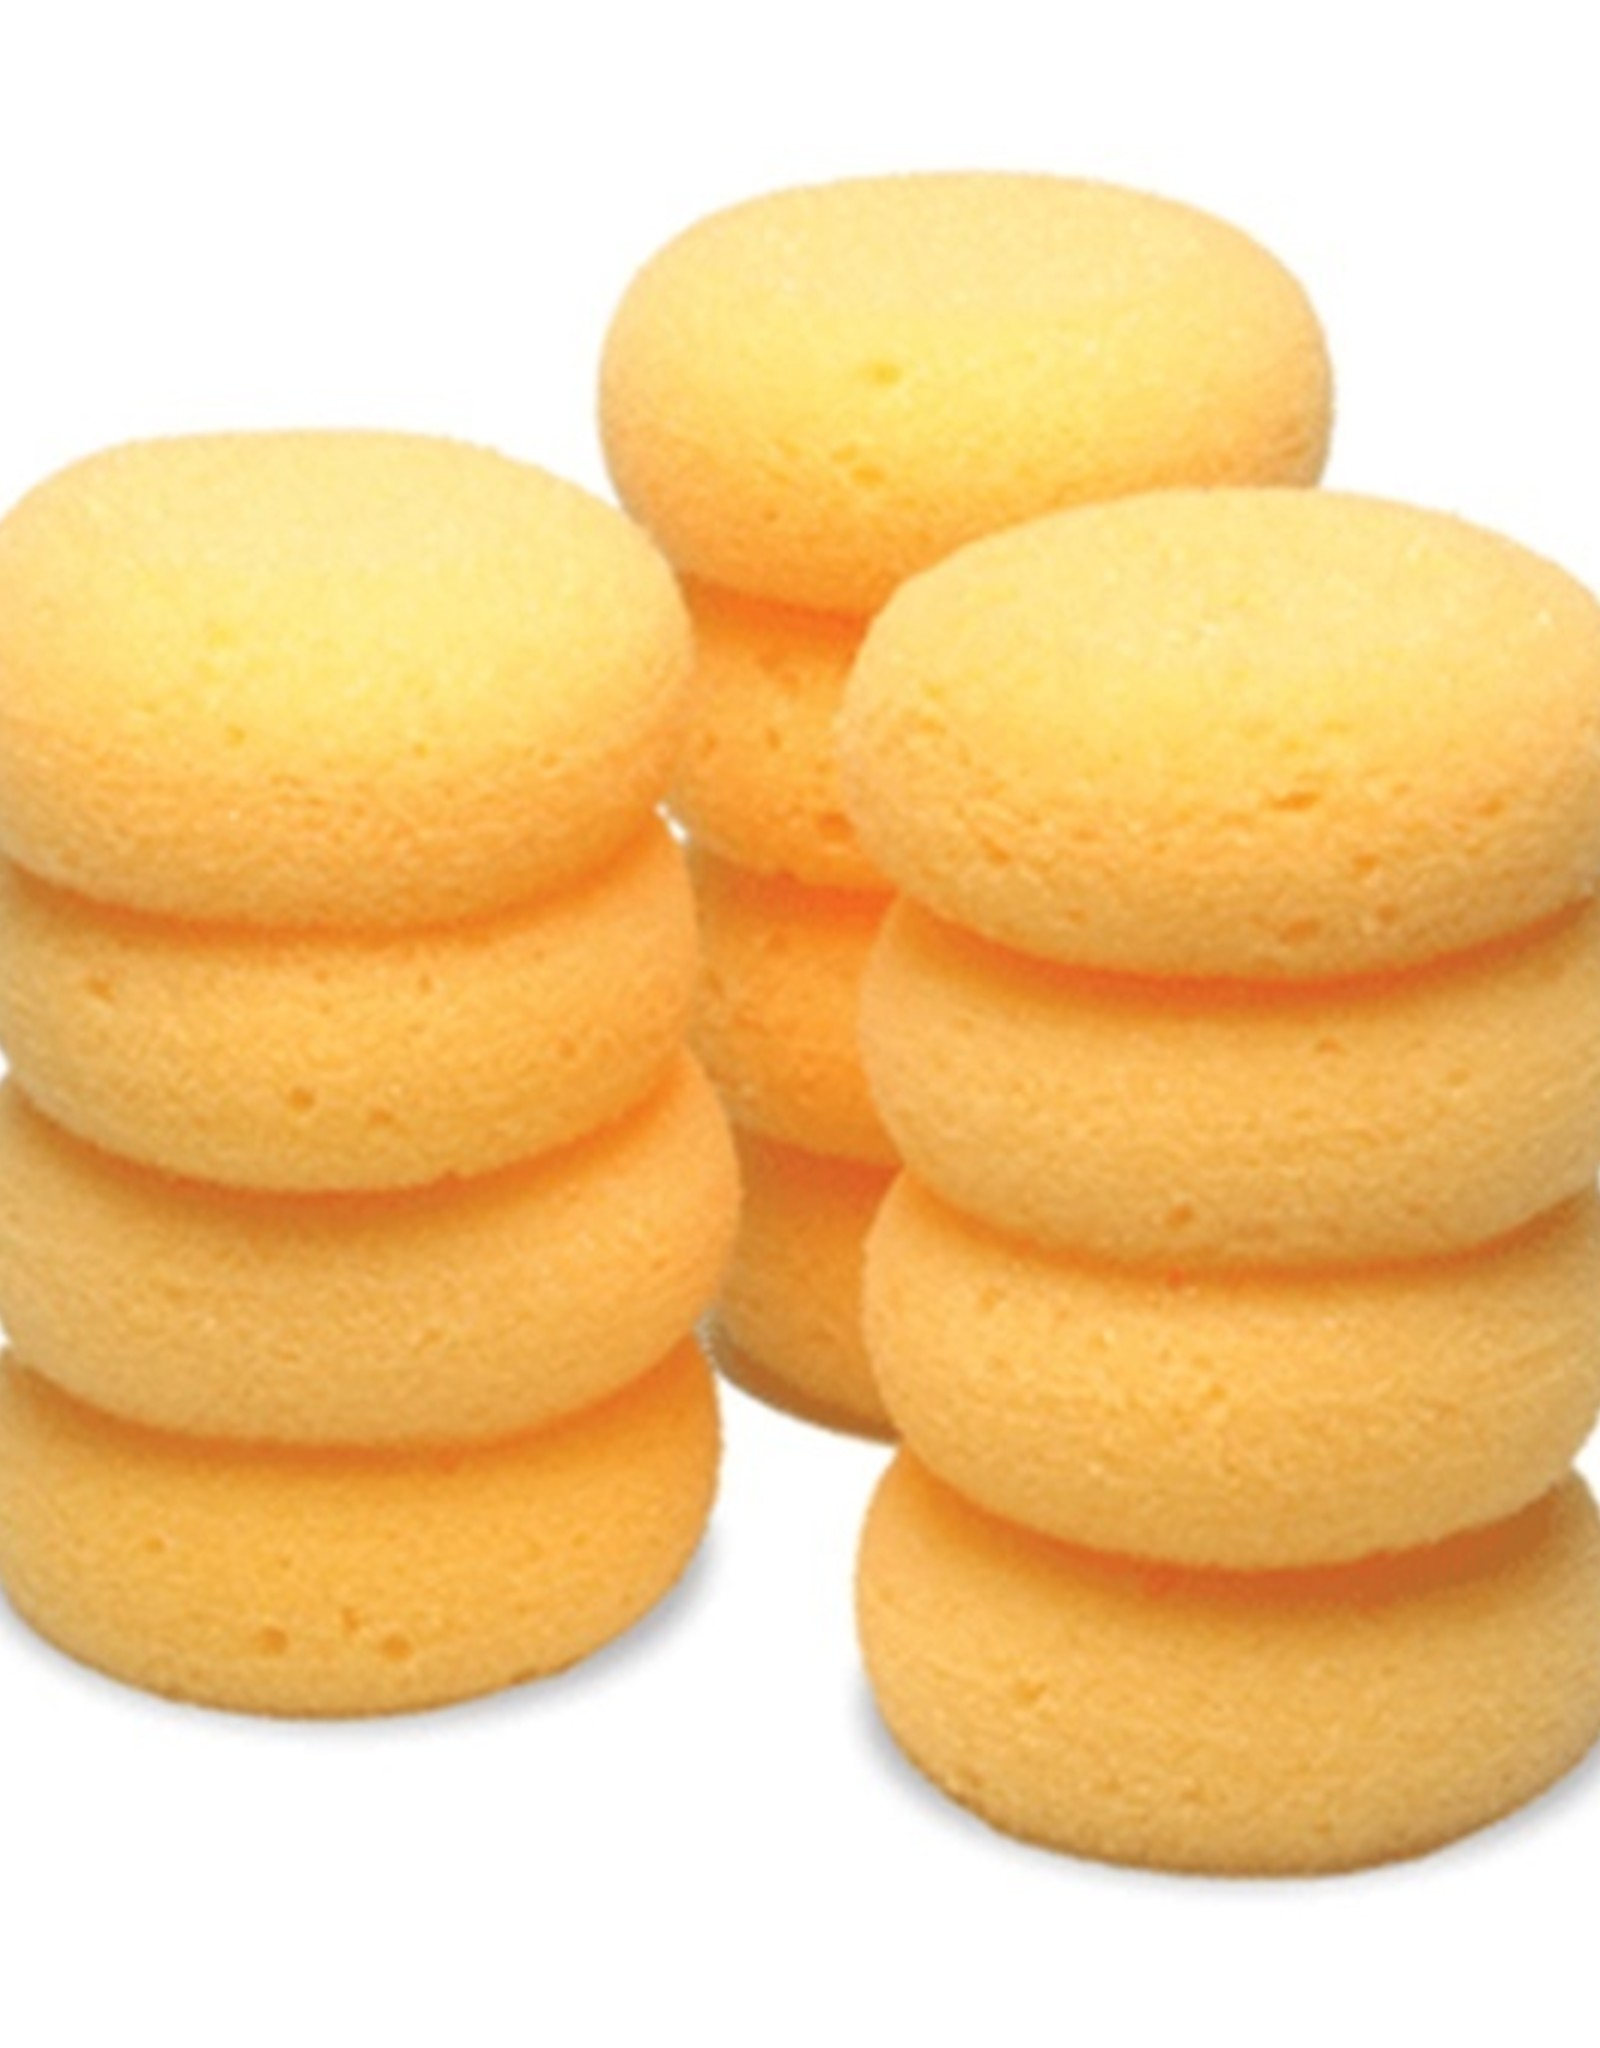 Jack's Round Tack Sponges - 12pk